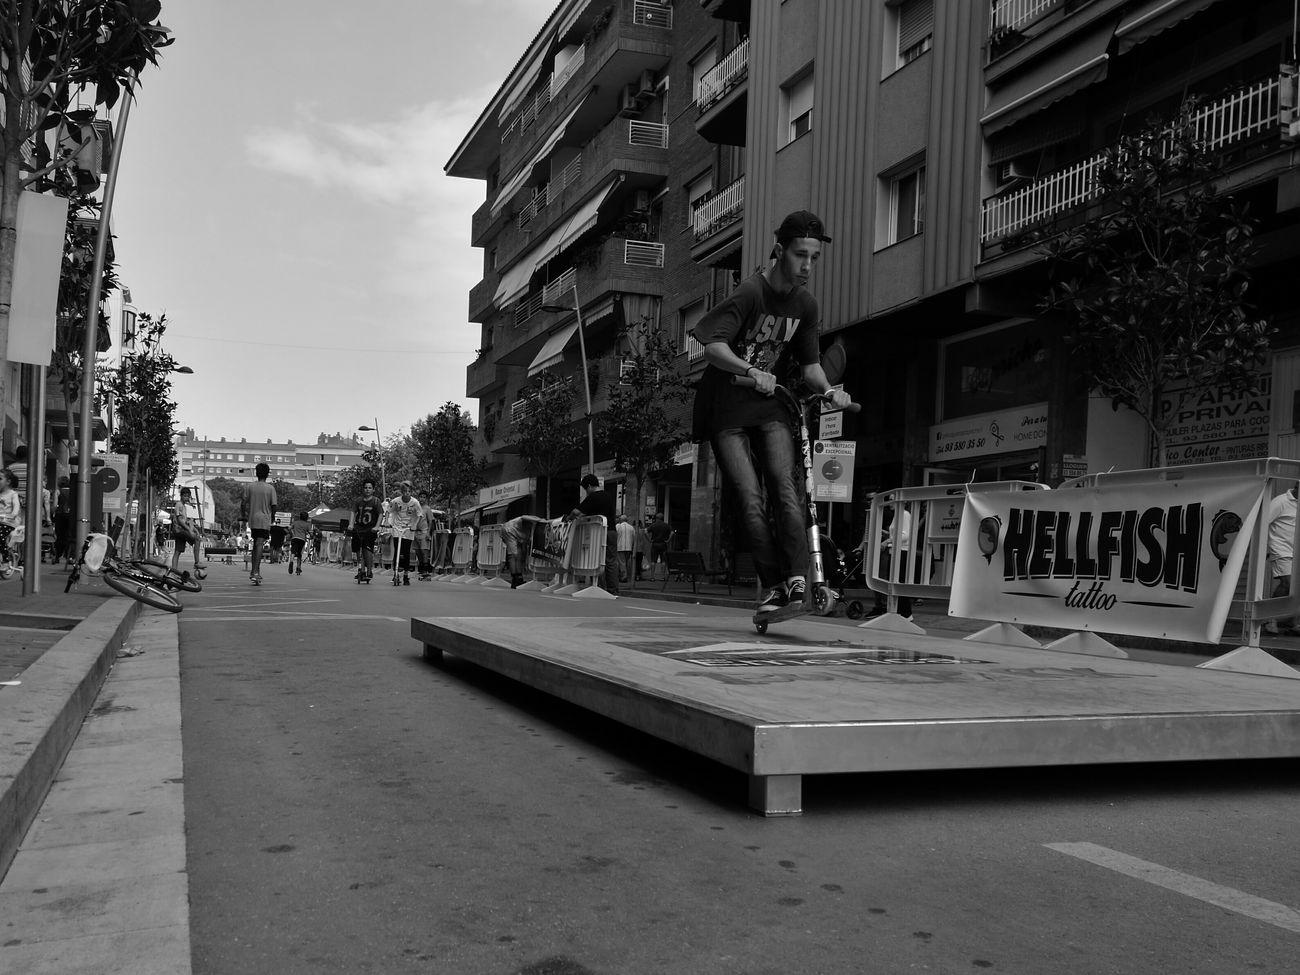 Skateboarding Skate Scooter Boy City Life City Street City Street City Life Outdoors Leica Black And White Huaweip9monochrome P9monochrome HuaweiP9